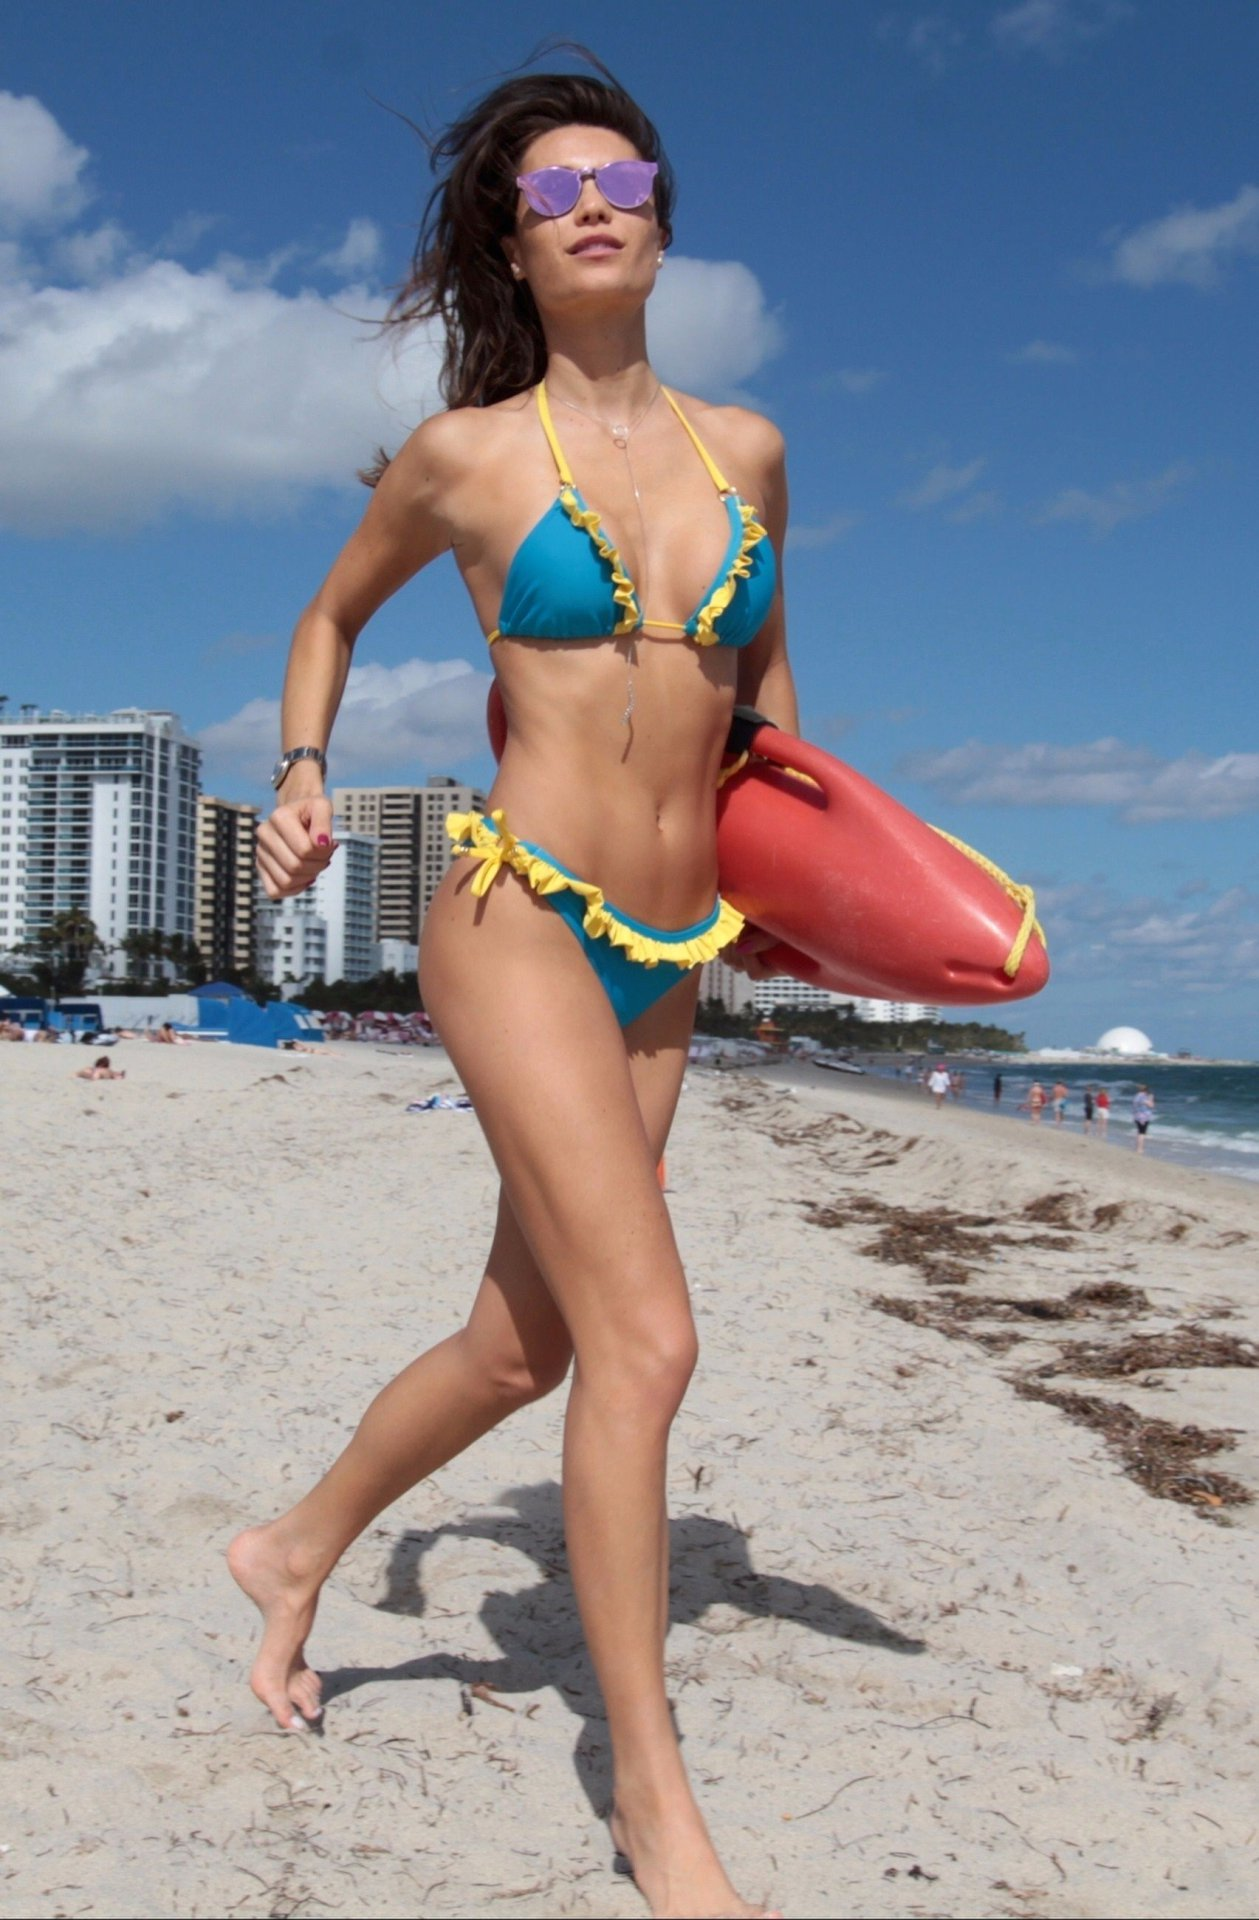 Beach topless miley cyrus